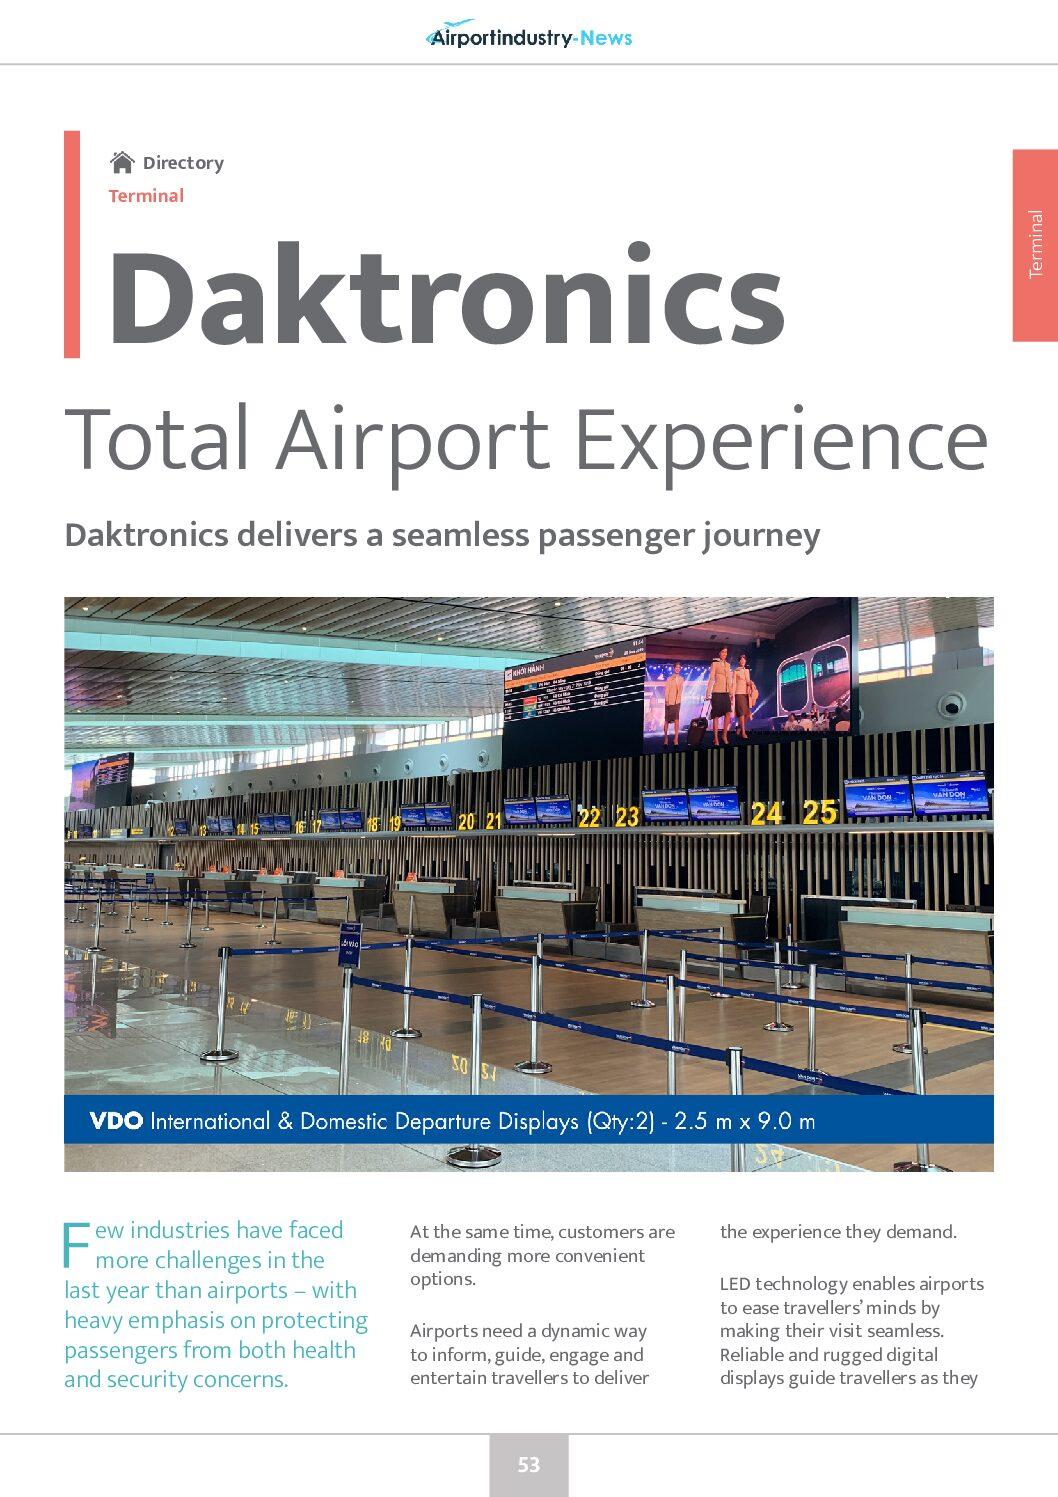 Daktronics – Total Airport Experience